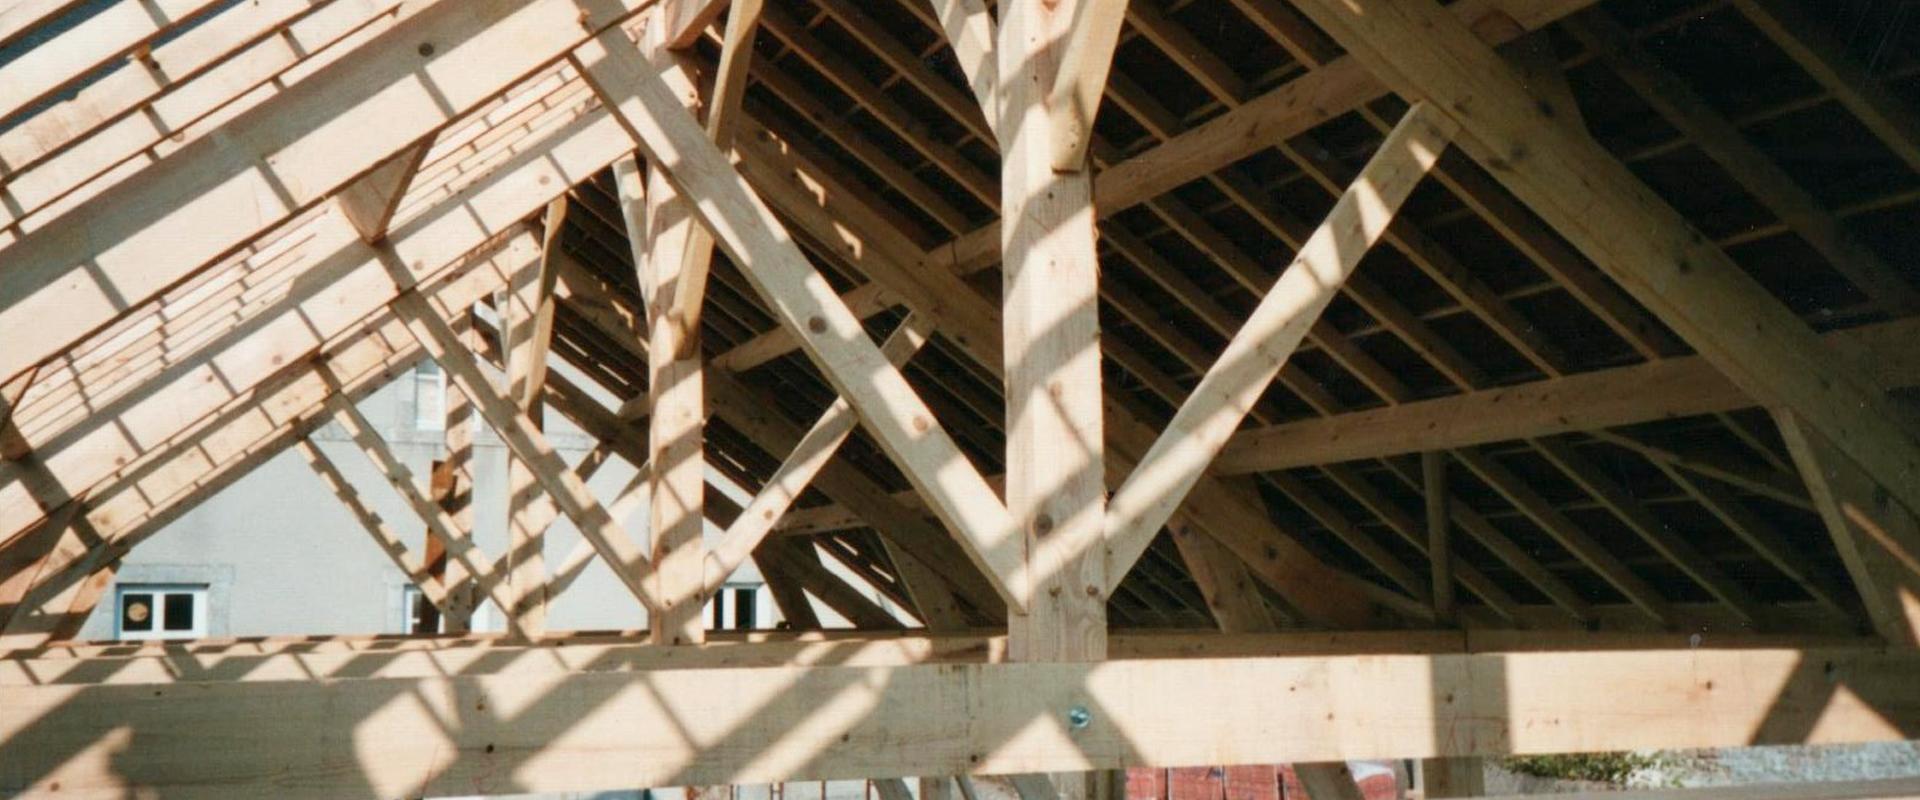 accueil charpente couverture toiture creuse aubusson audouze charpente couverture aubusson creuse. Black Bedroom Furniture Sets. Home Design Ideas